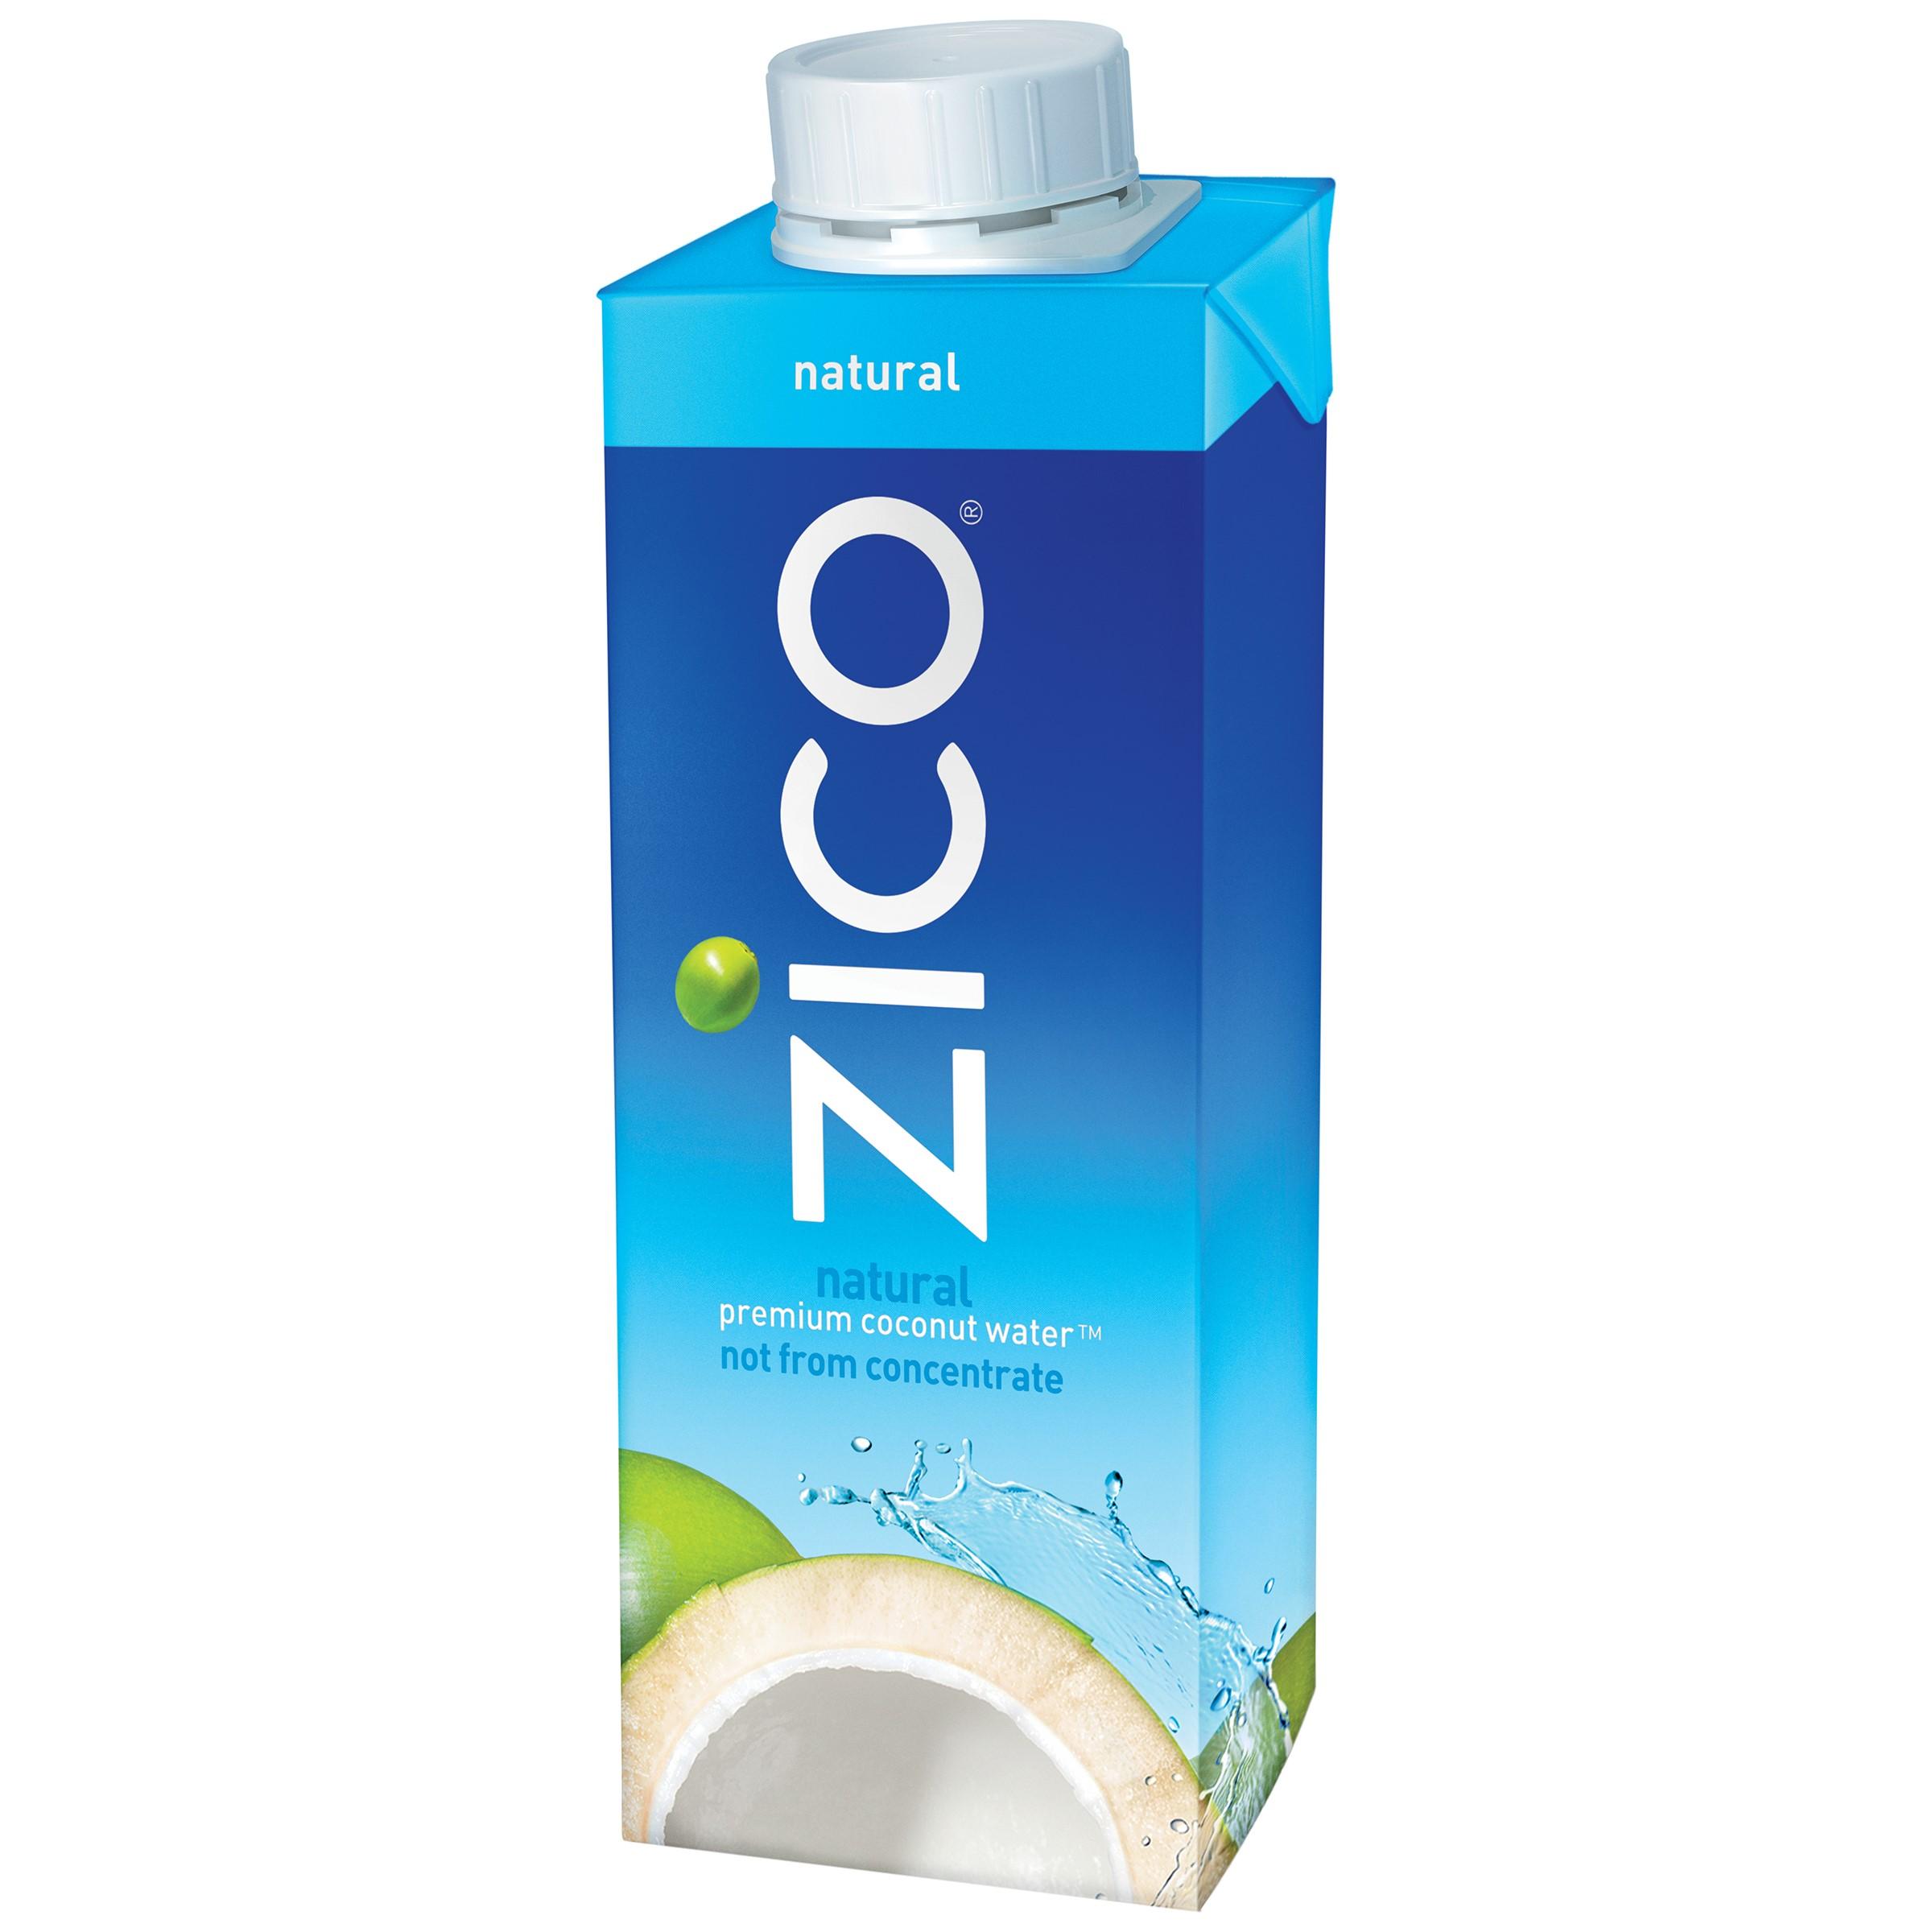 ZICO Coconut Water, Natural, 8.45 Fl Oz